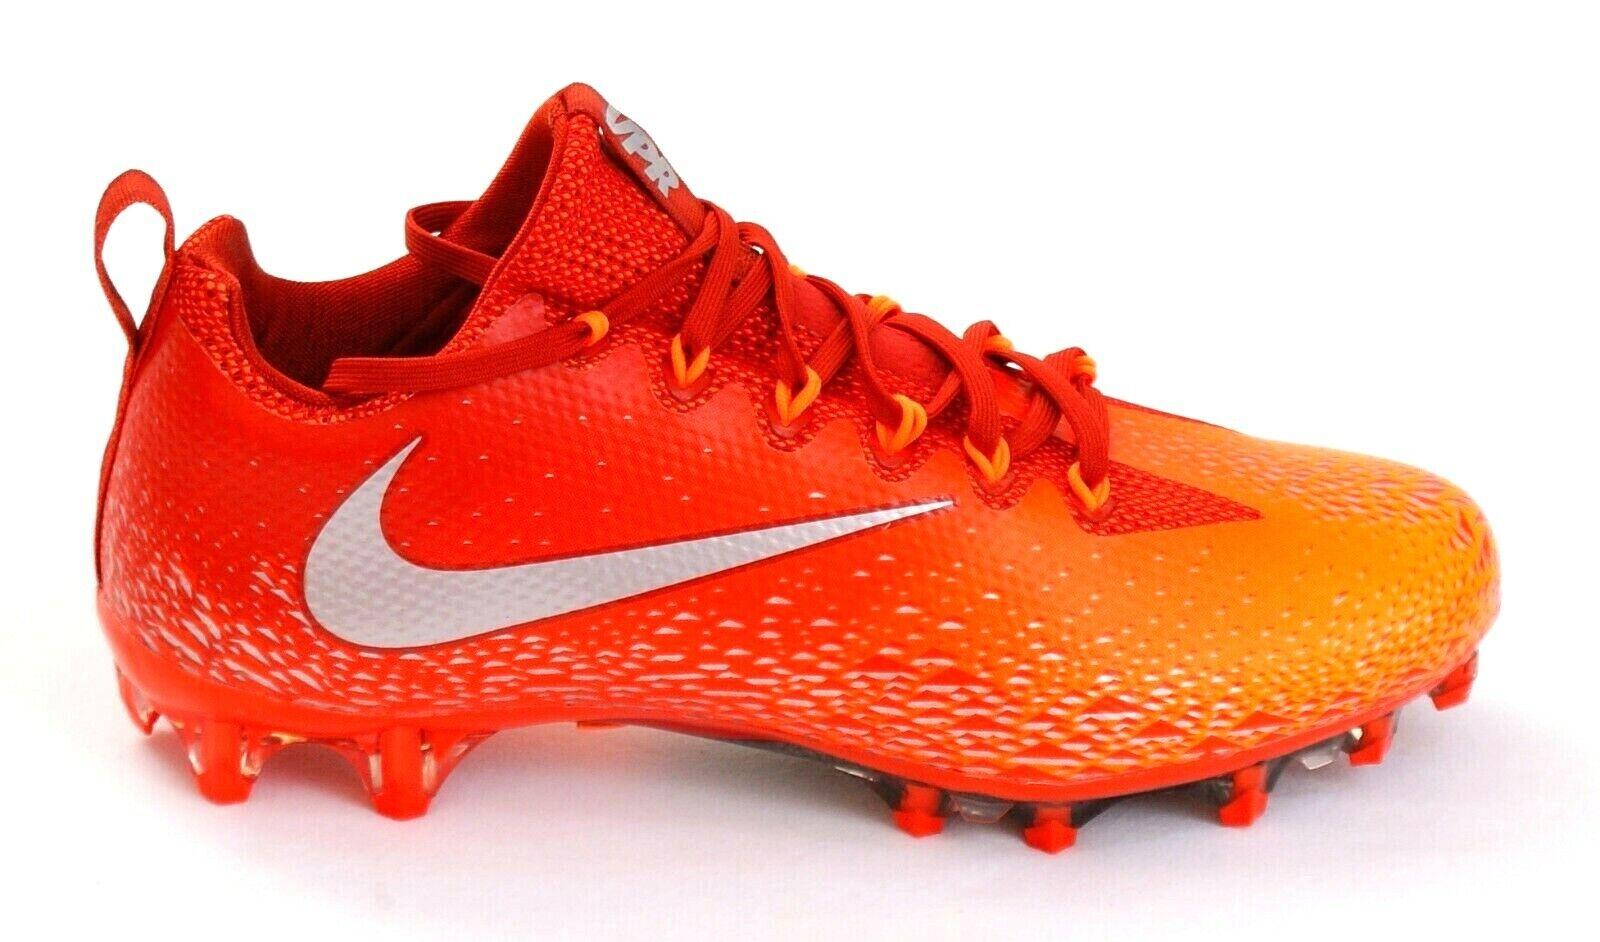 Nike Vapor Untouchable Pro orange Football Cleats Men's NIB